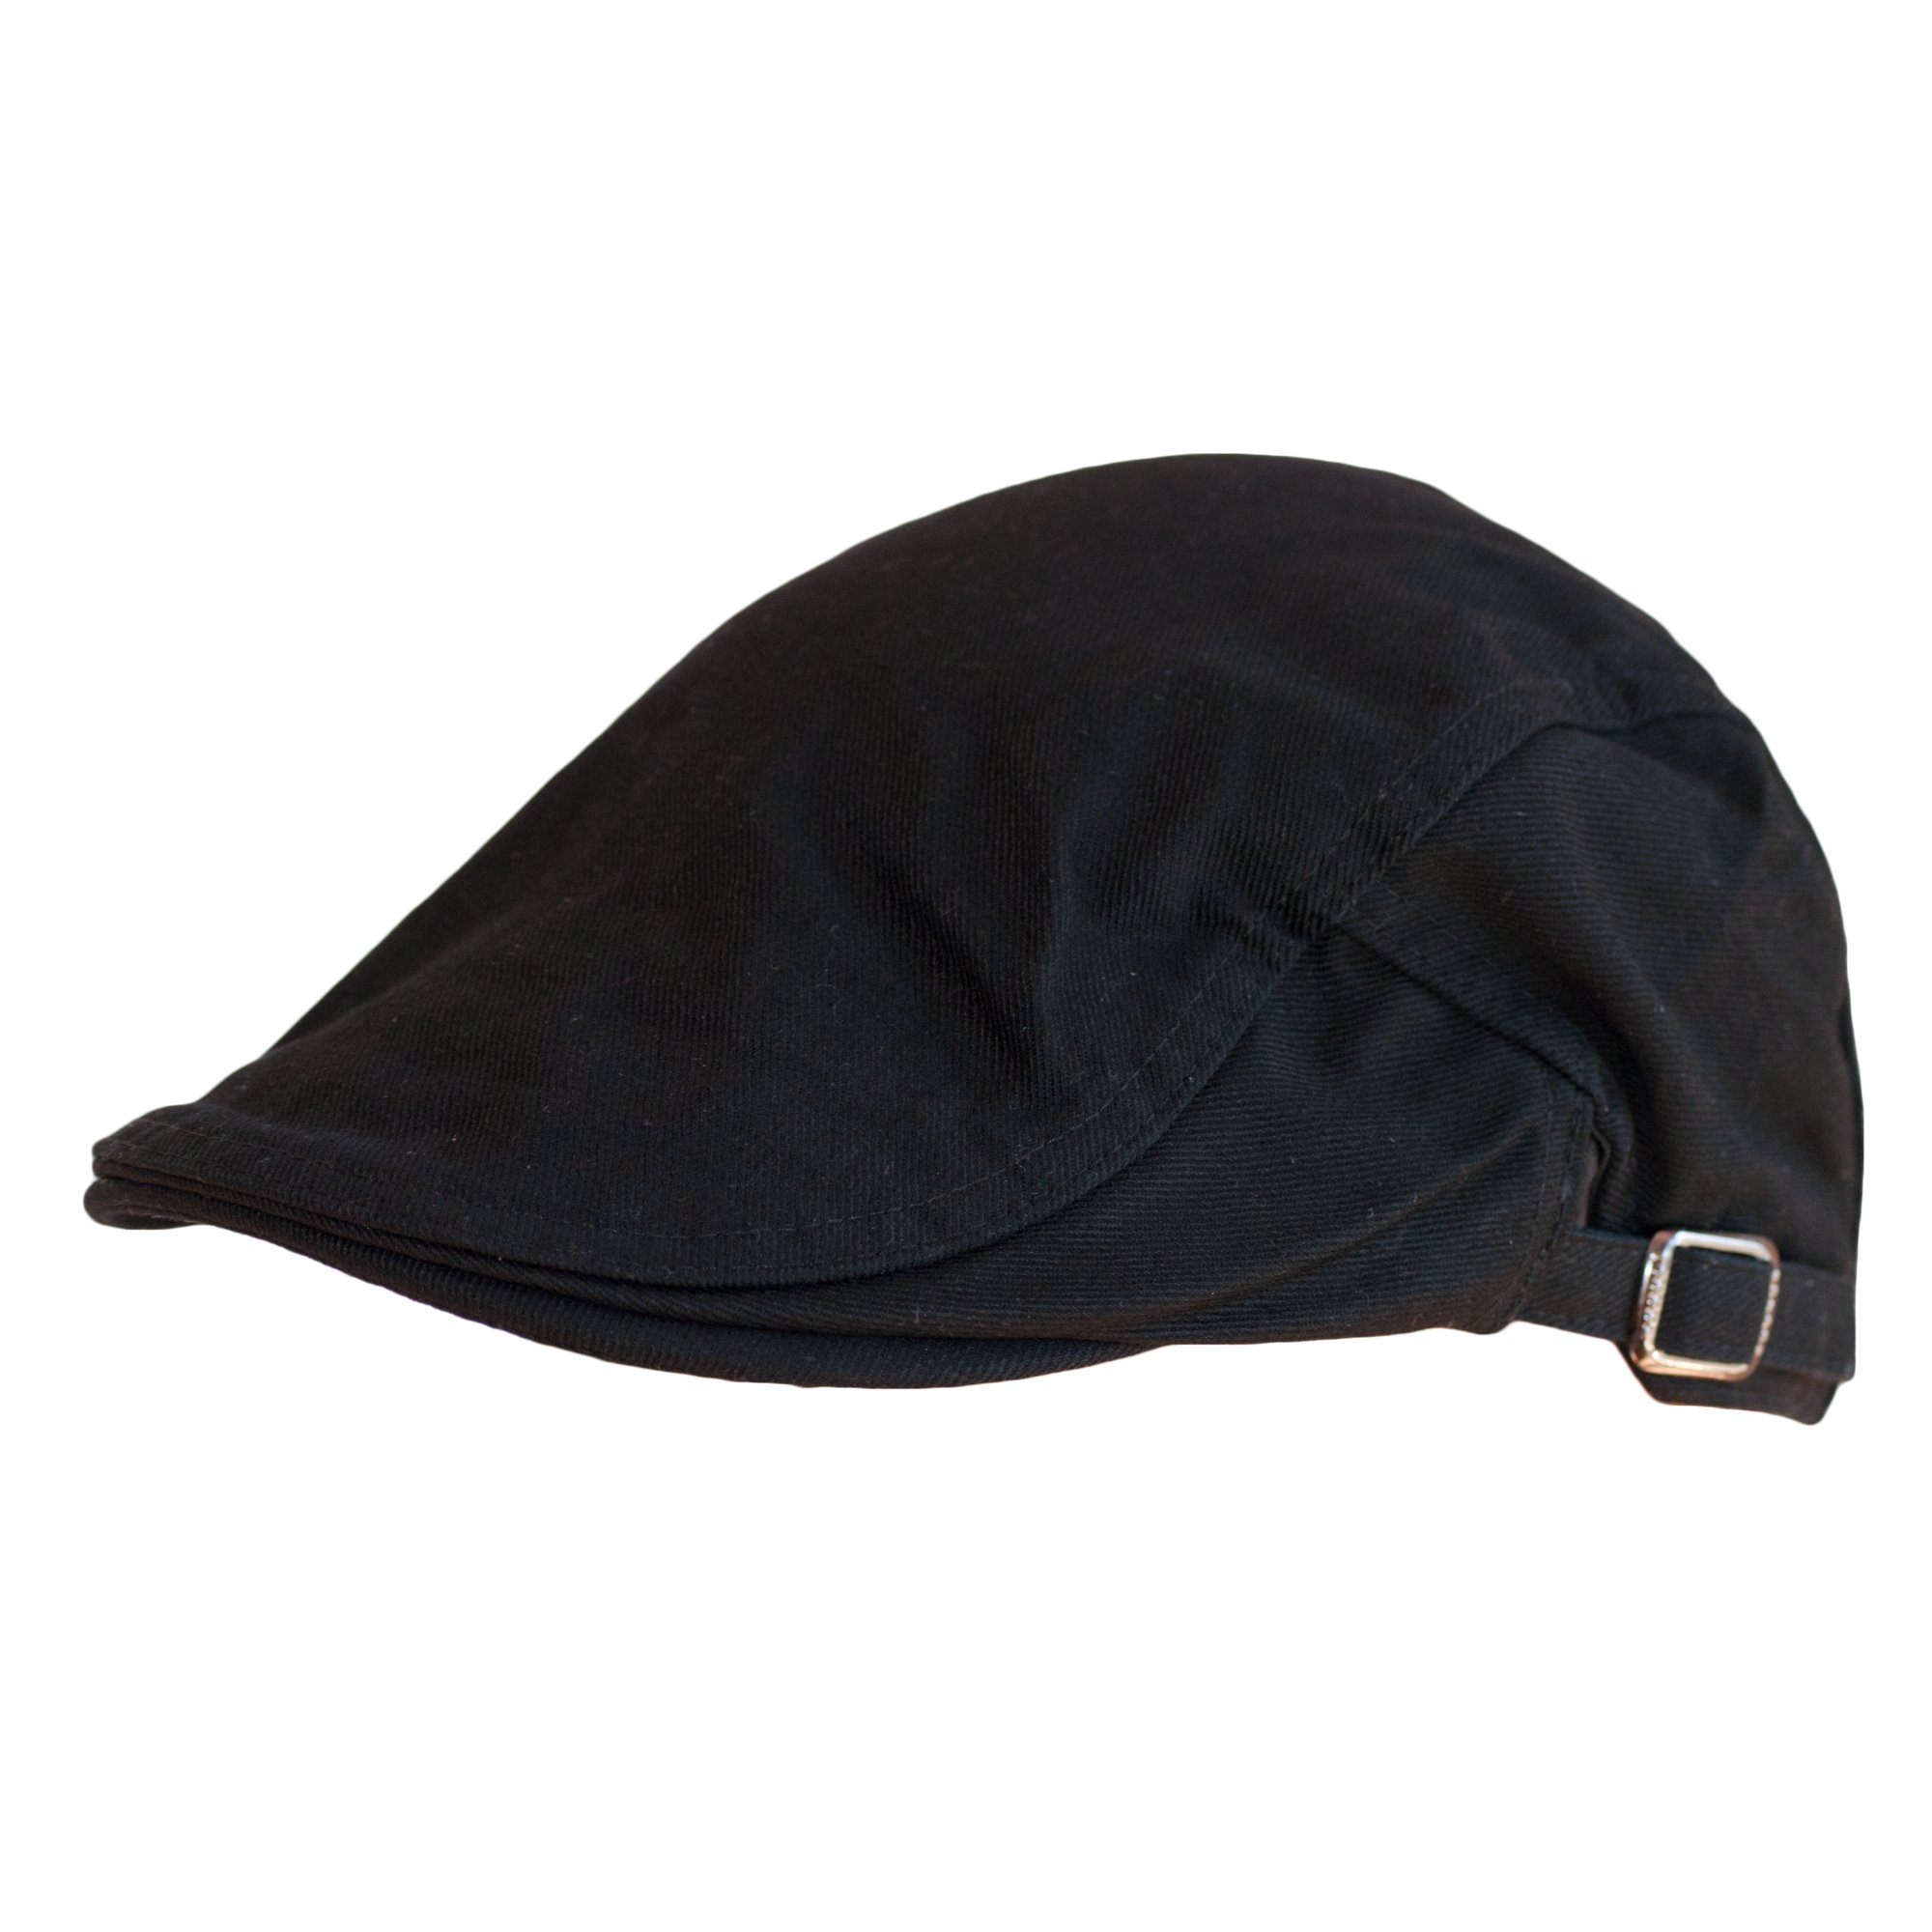 Dazoriginal Sombrero Plano Hombre Gorra Mujer Boina Hombre Gatsby Ivygorra  Beret product image c215534e3eb